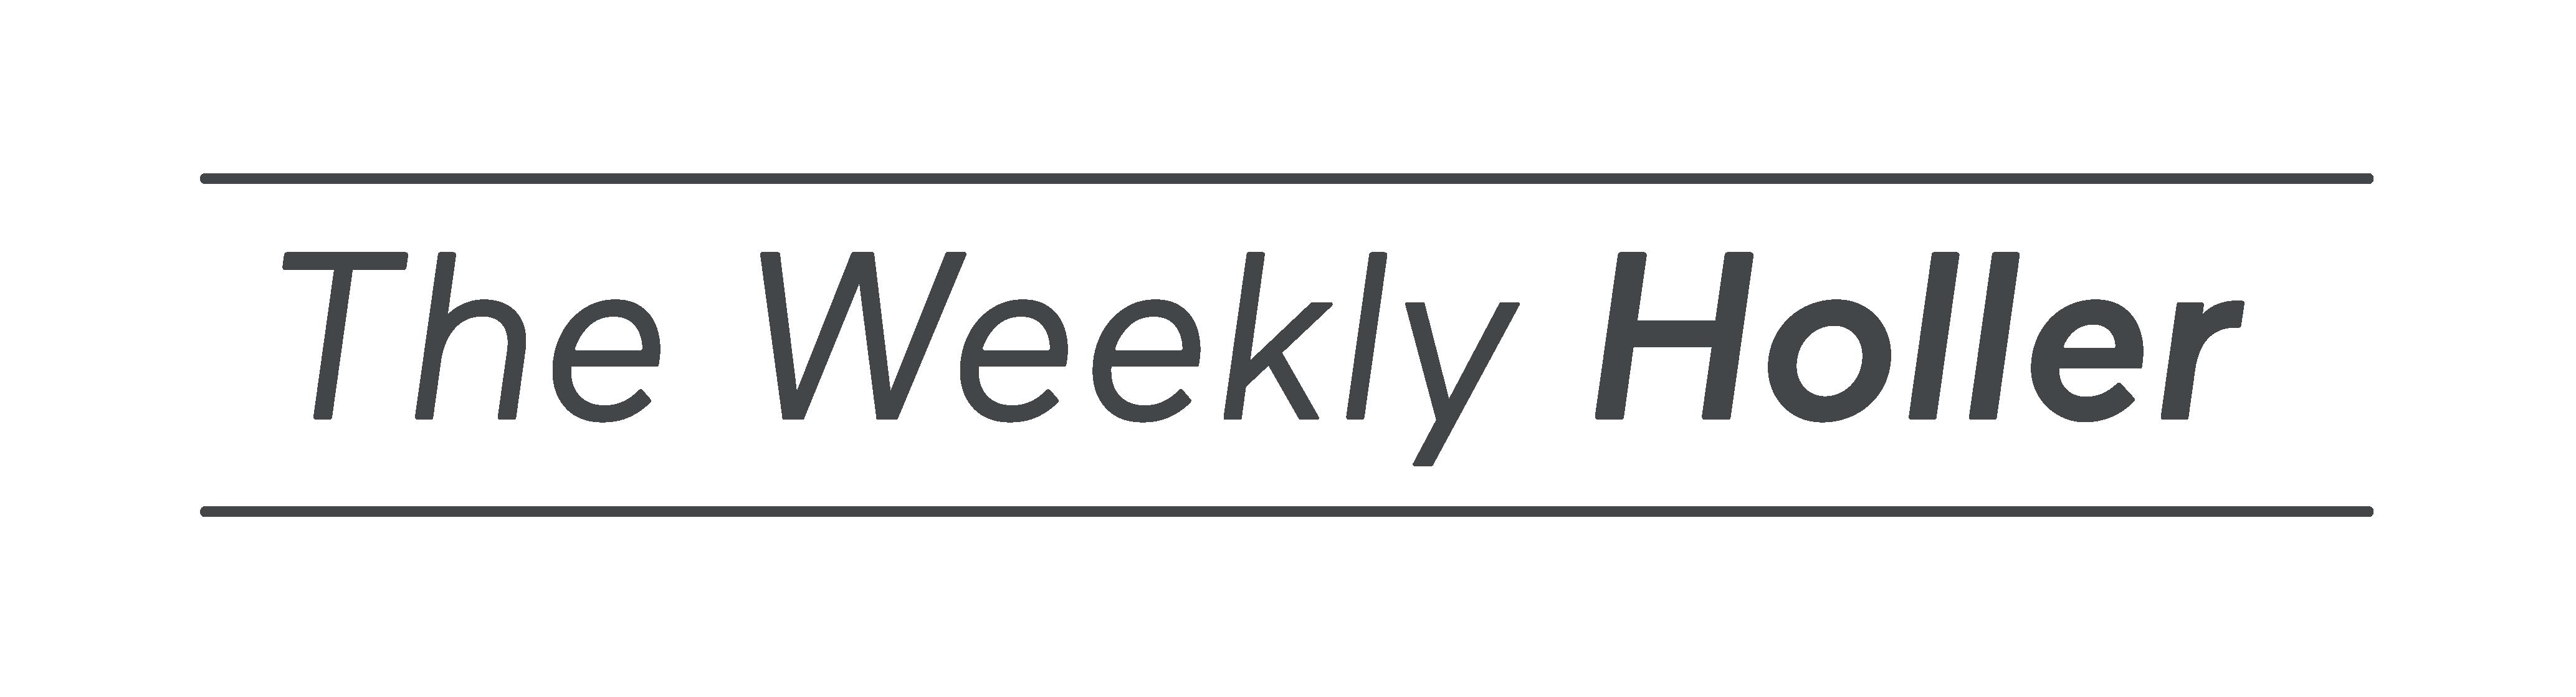 WeeklyHoller-Logo-01